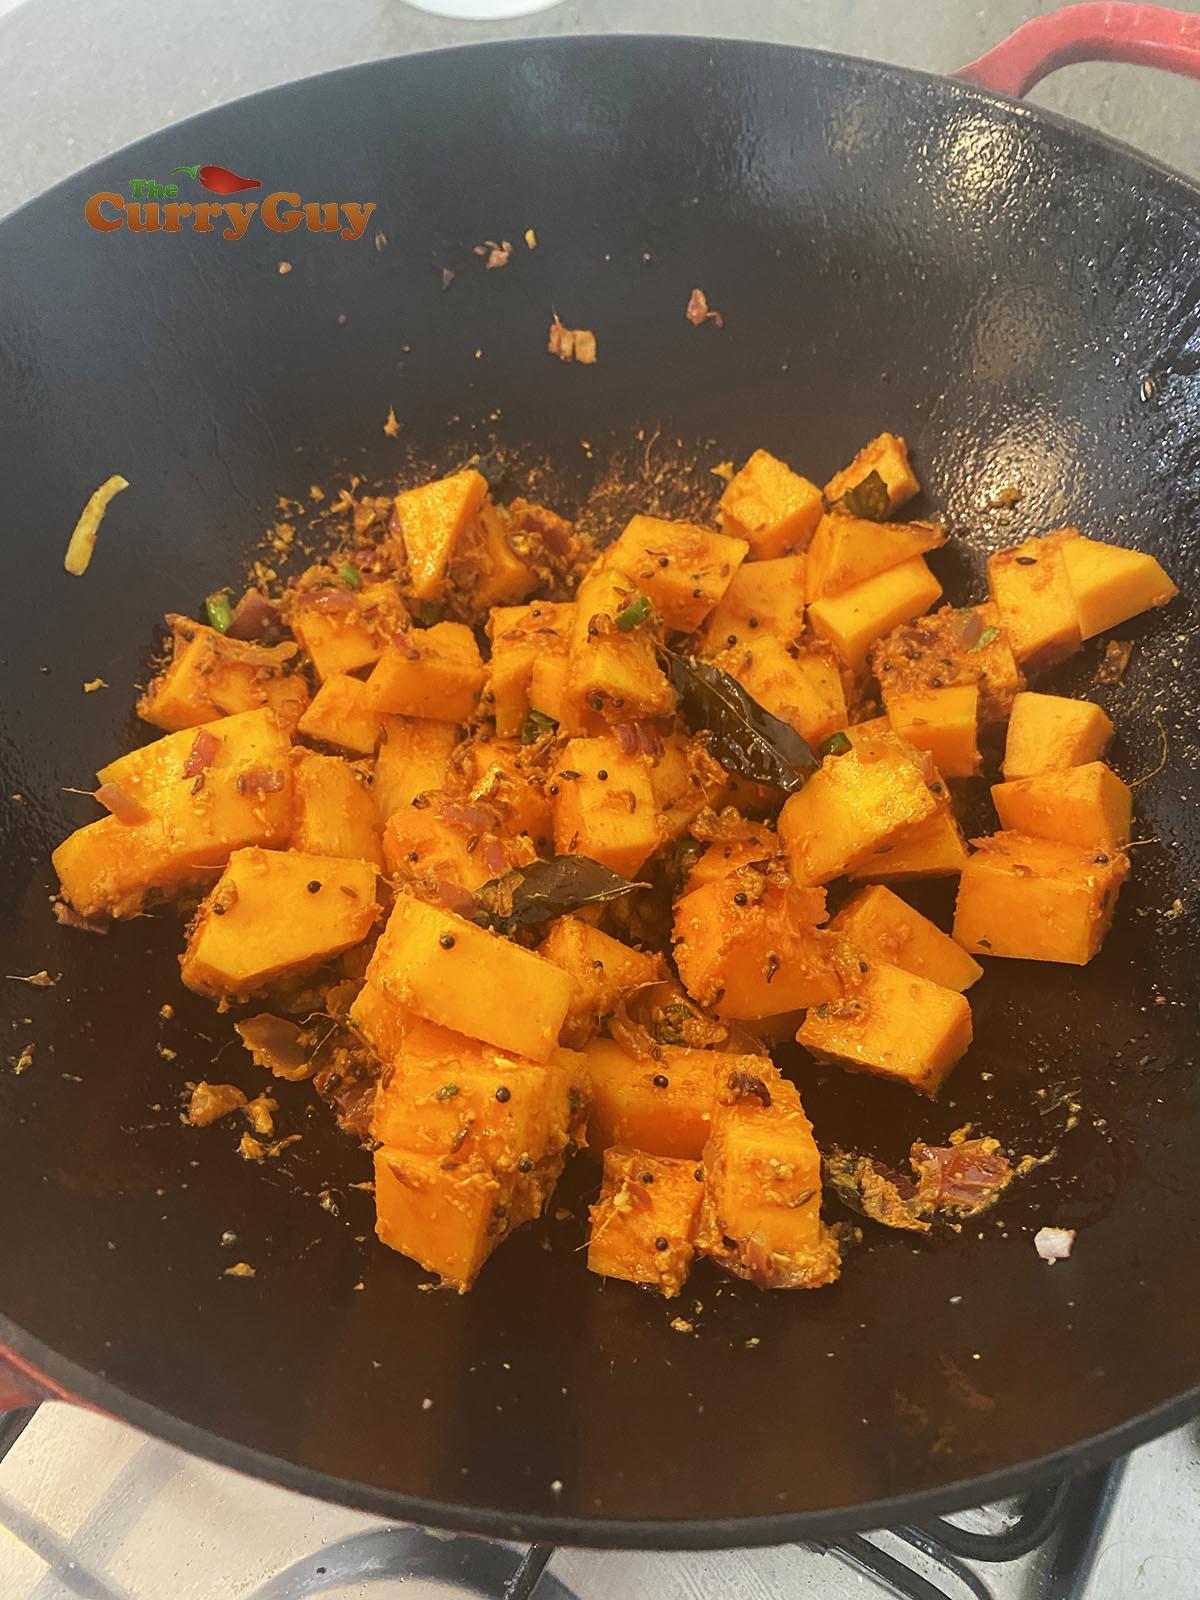 Adding butternut squash to the butternut squash curry